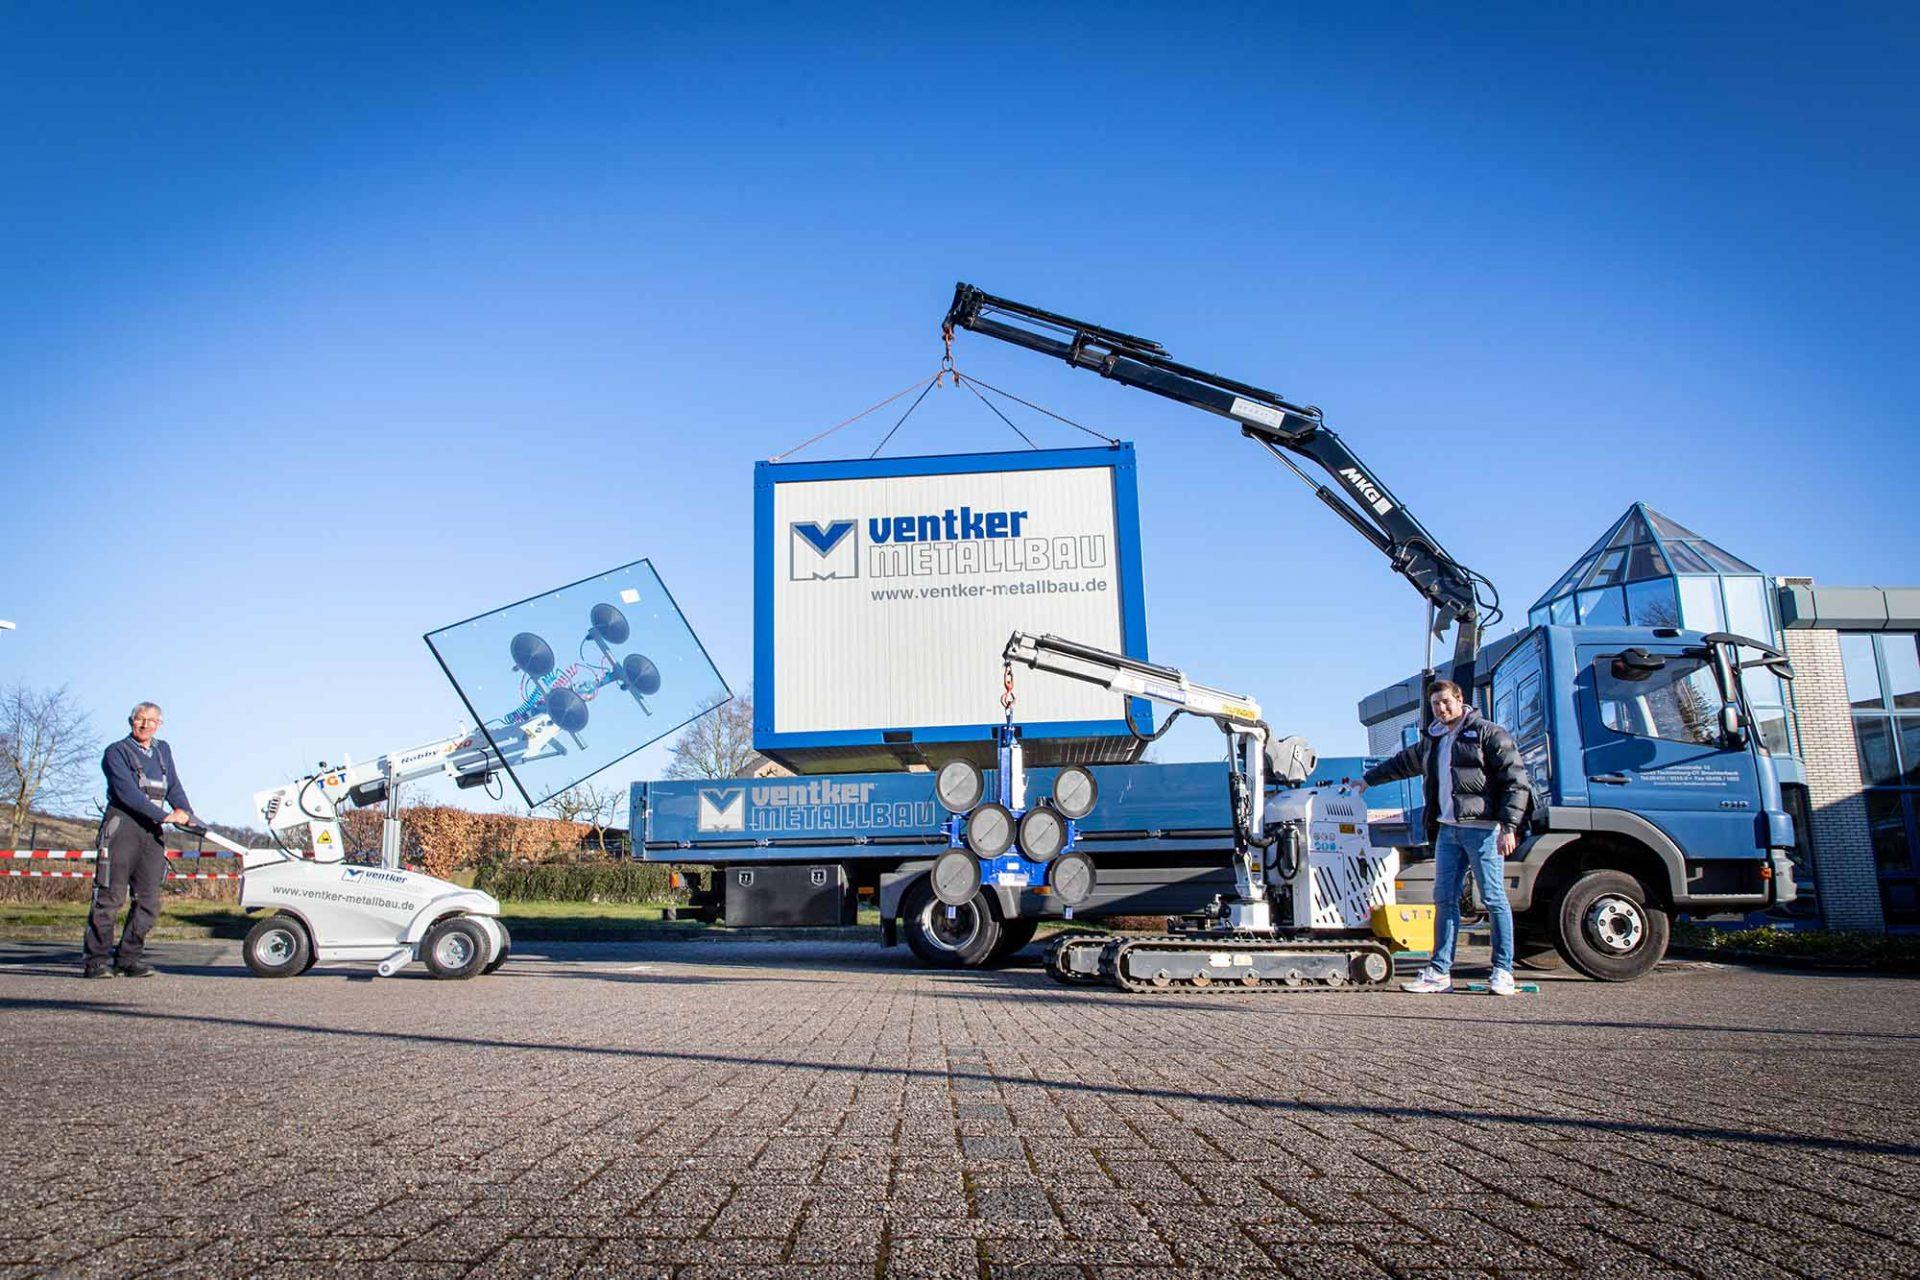 Ventker Metallbau Glasscheiben Transport